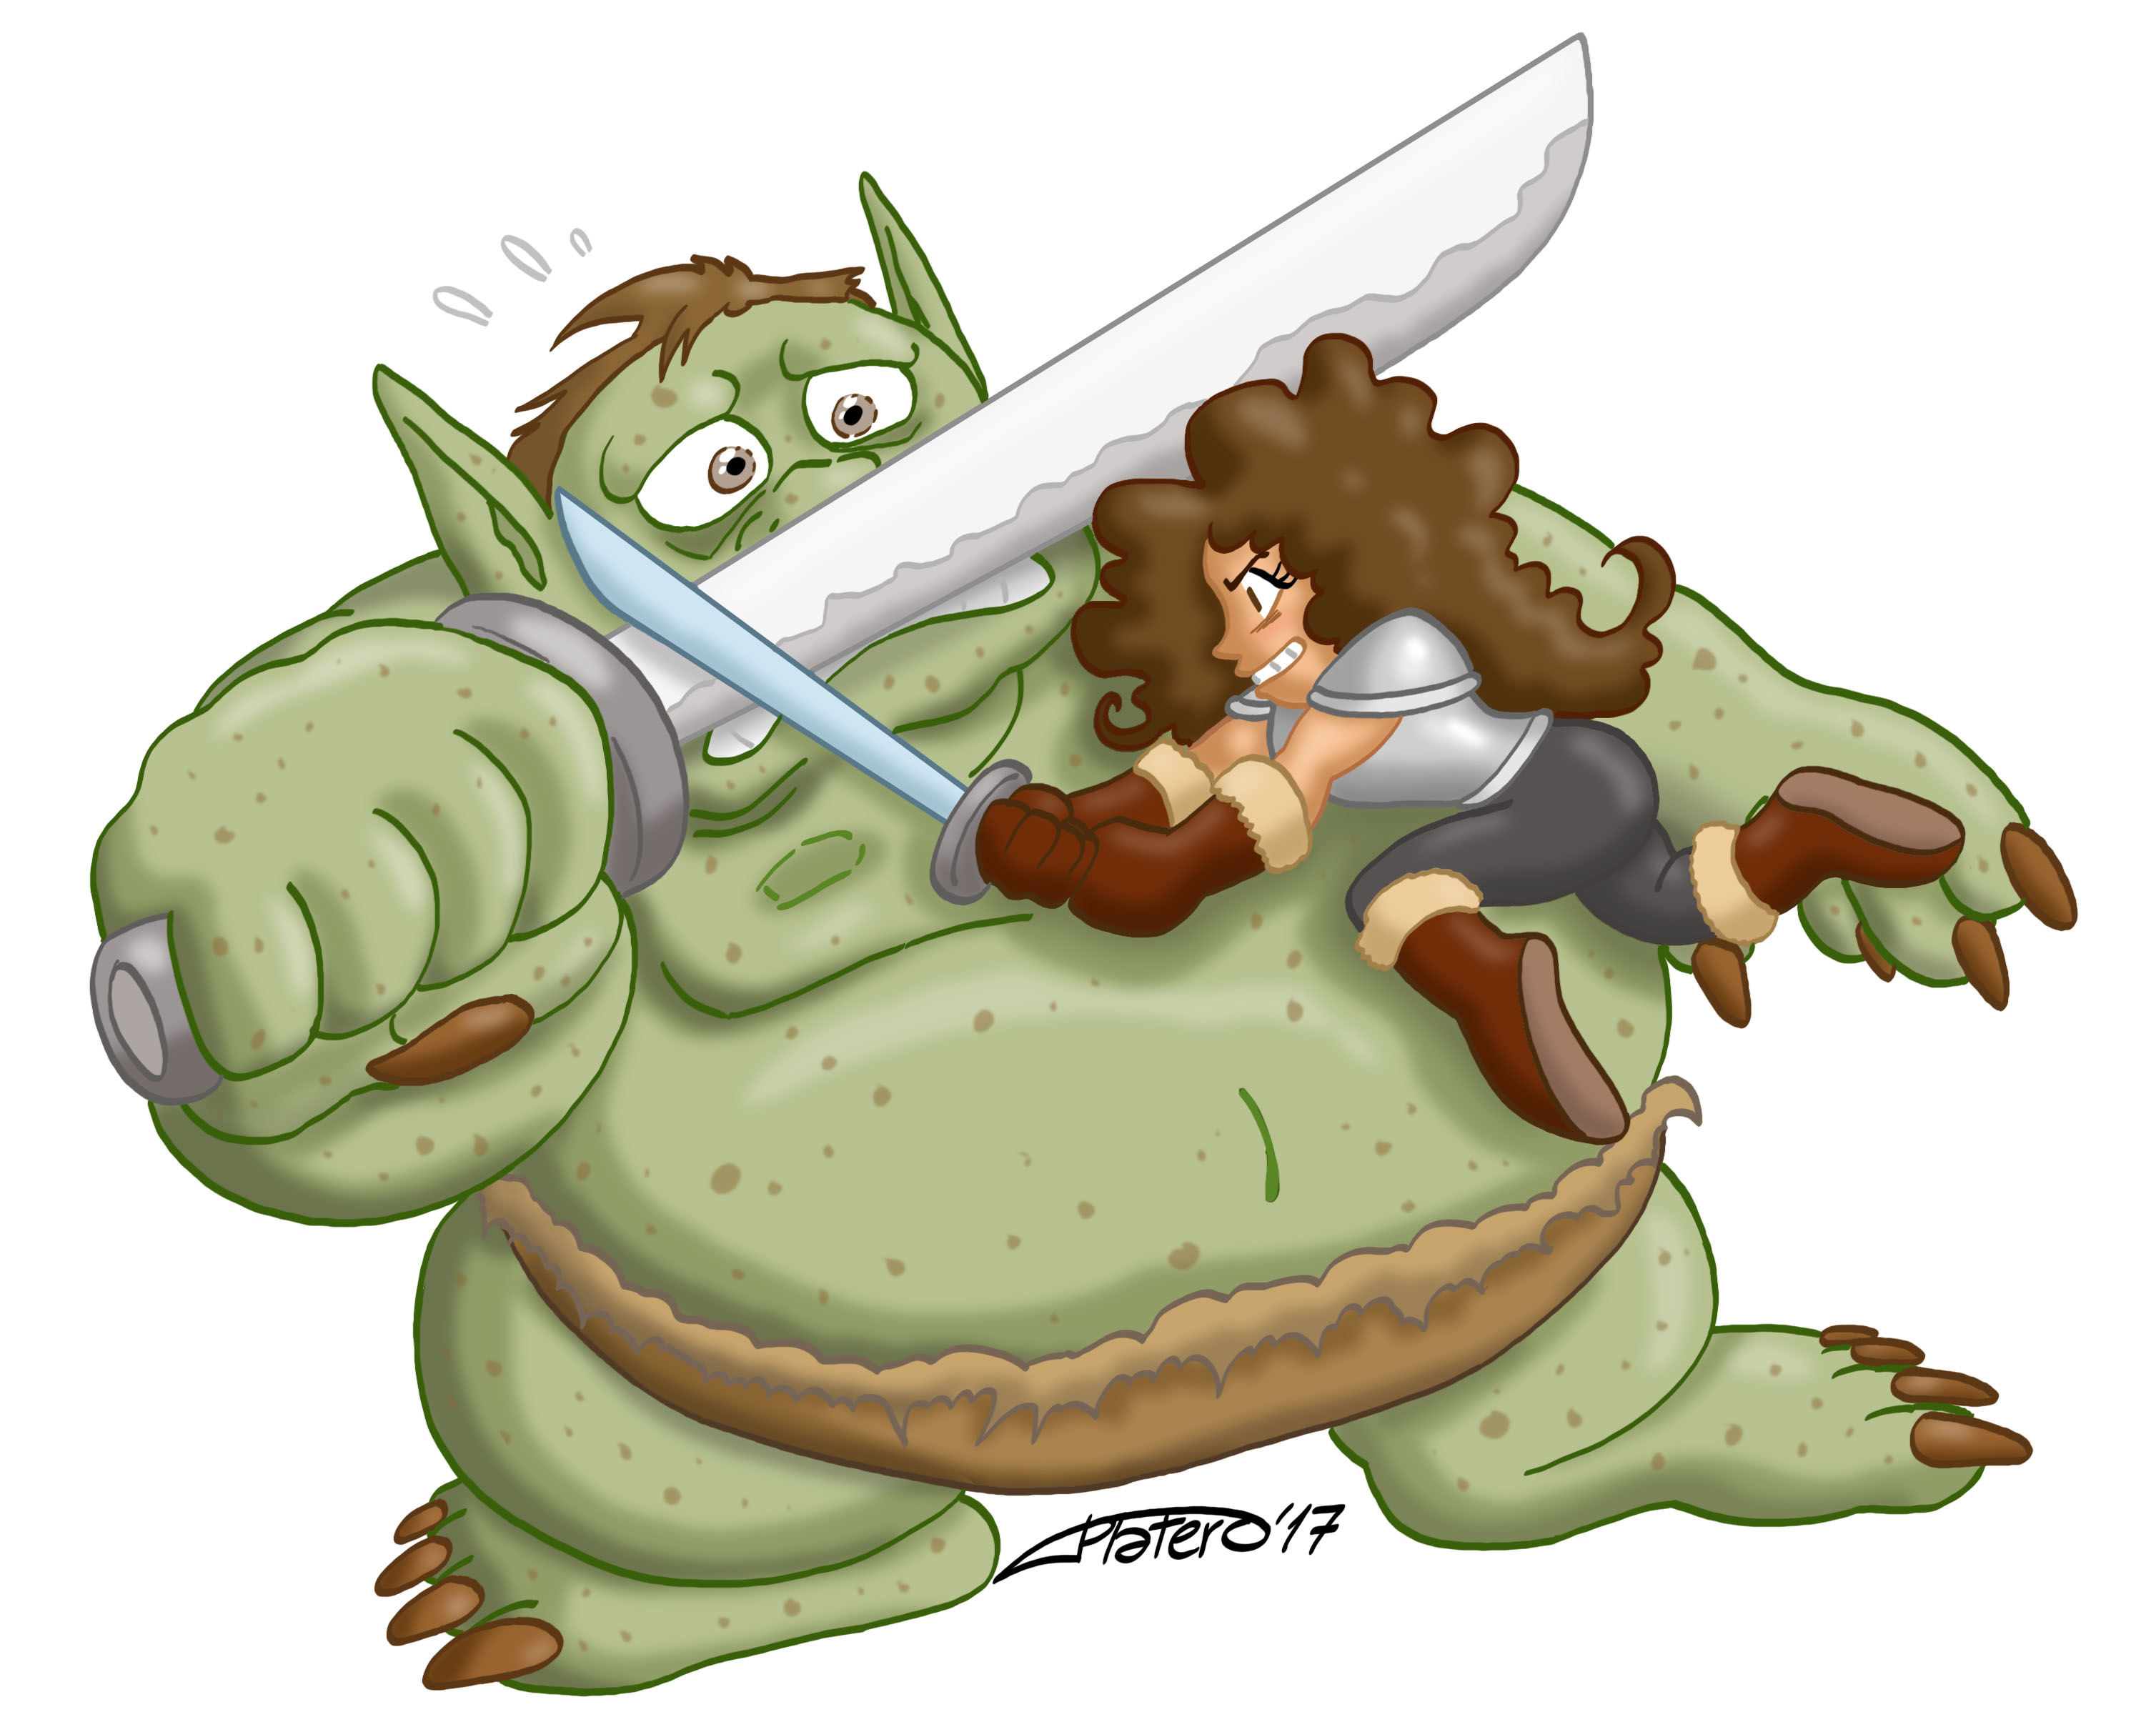 Chica guerrera luchando contra Troll